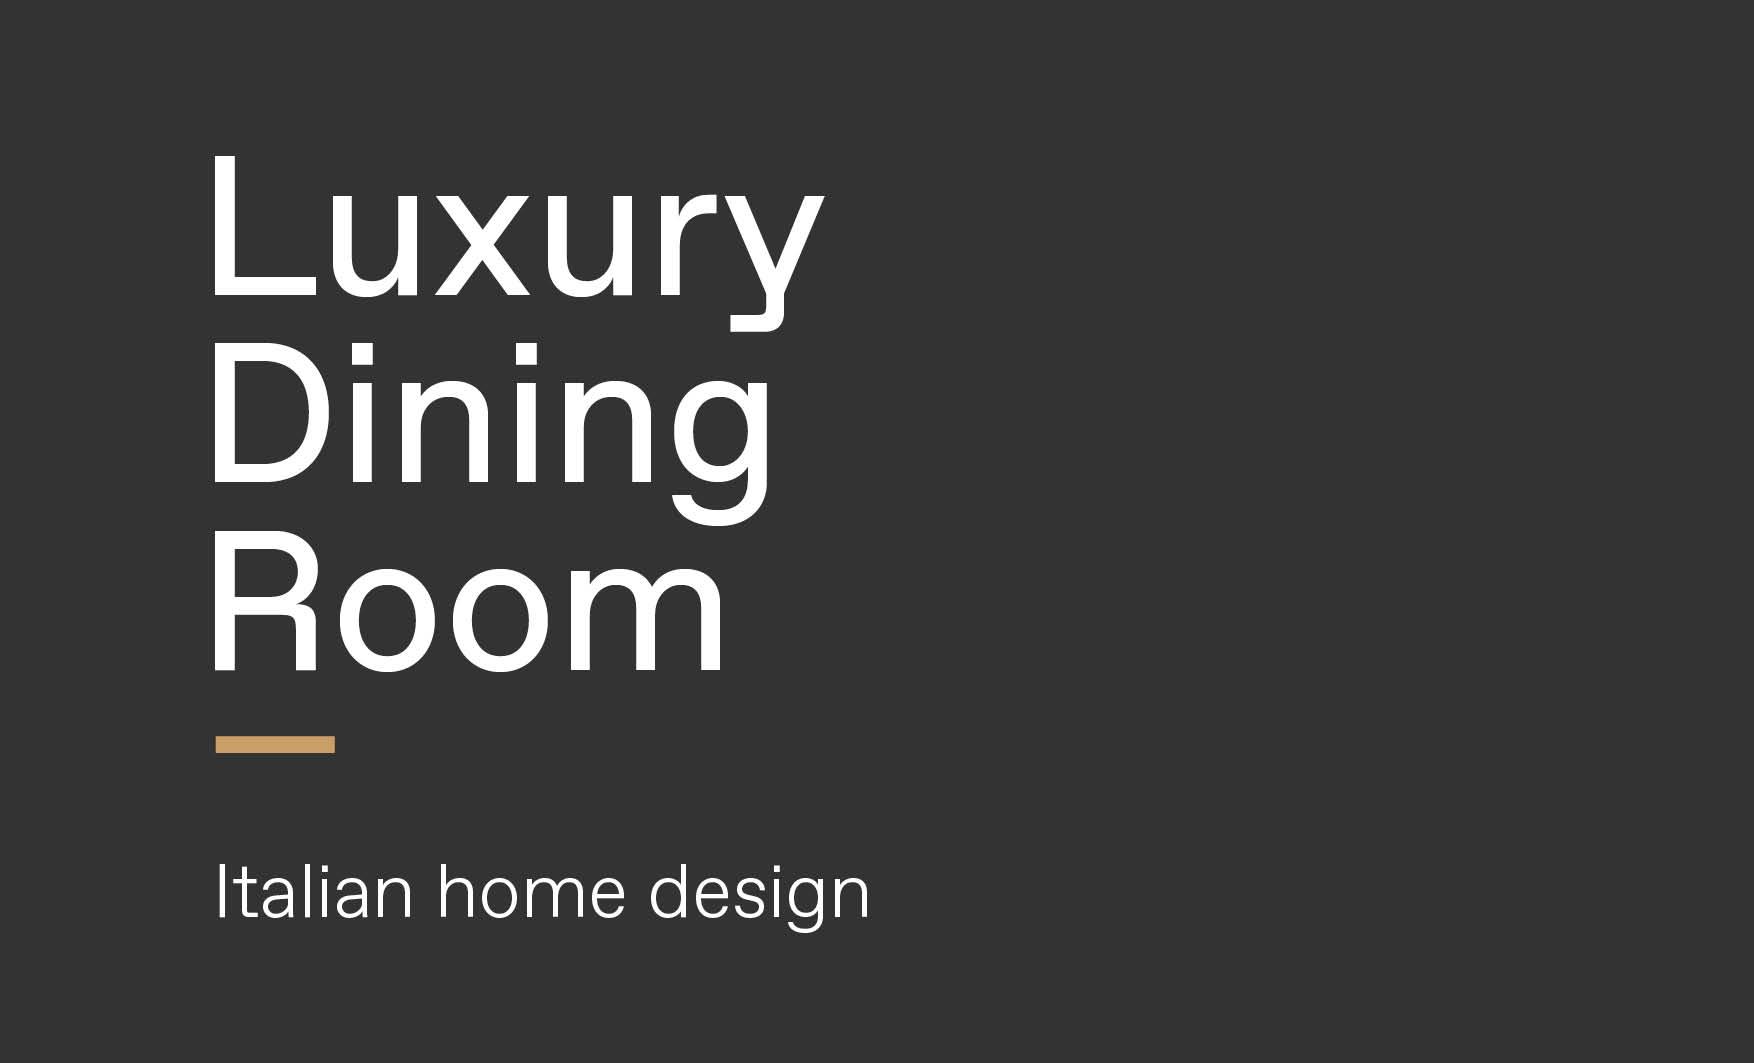 Concept of luxury Italian dining room design made by Esperiri team